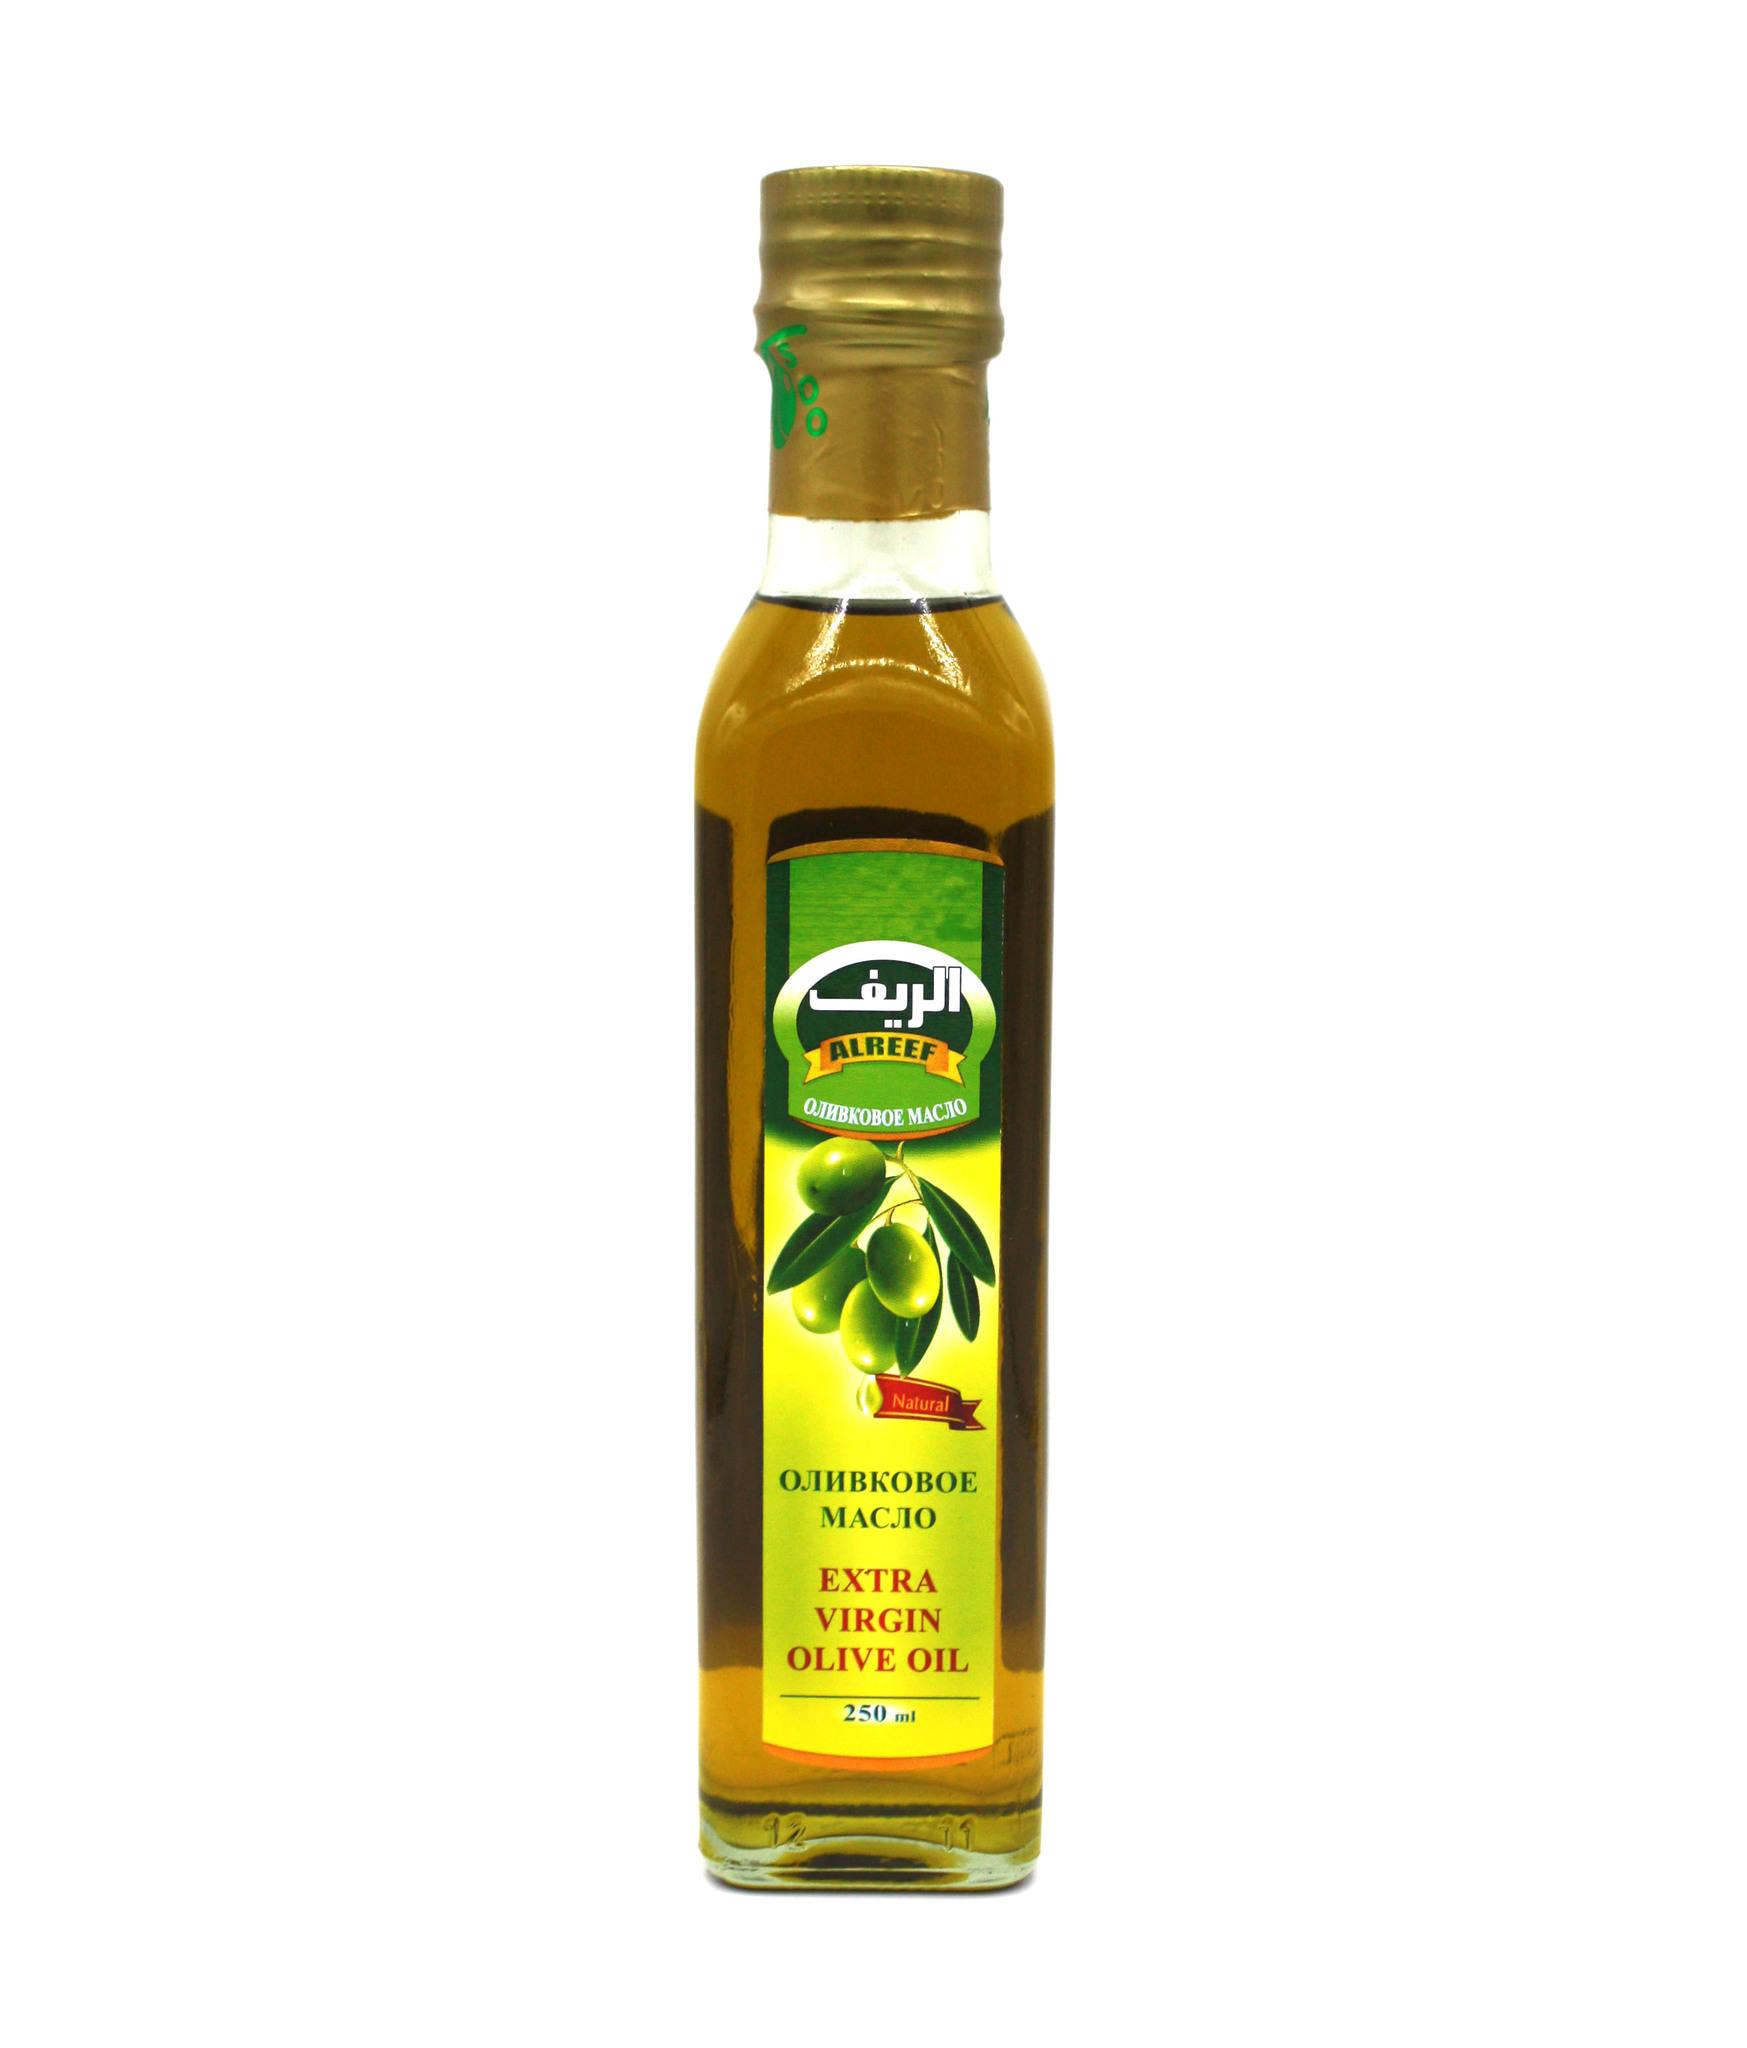 Оливковое масло Оливковое масло Al Reef, 250 мл import_files_a2_a24b6a3d67e911e89d8f448a5b3752ae_da0404c9657a11e8a996484d7ecee297.jpg